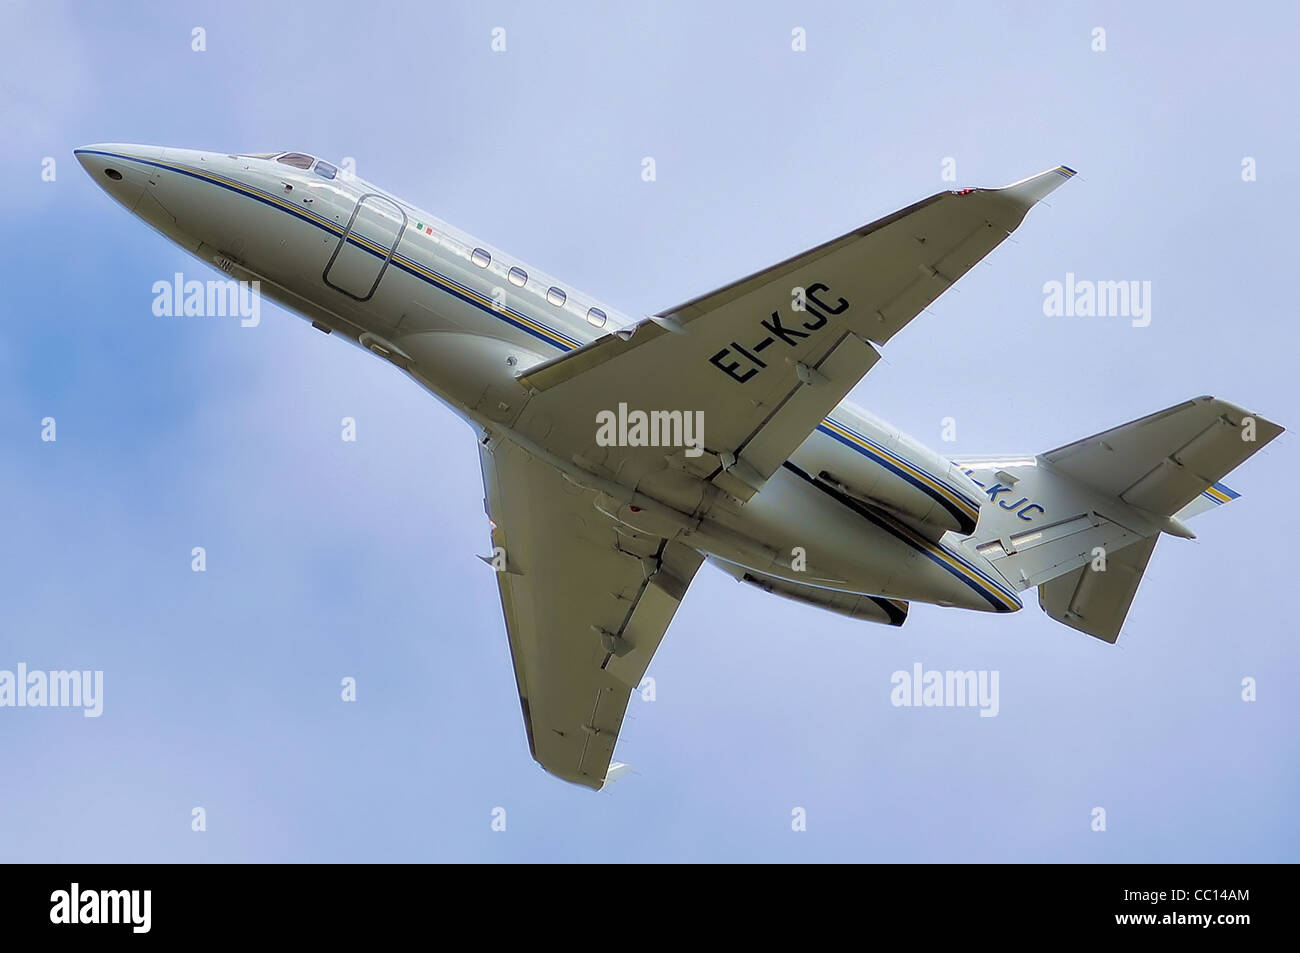 Raytheon Hawker 850XP (EI-KJC) takes off from Bristol International Airport, England. - Stock Image